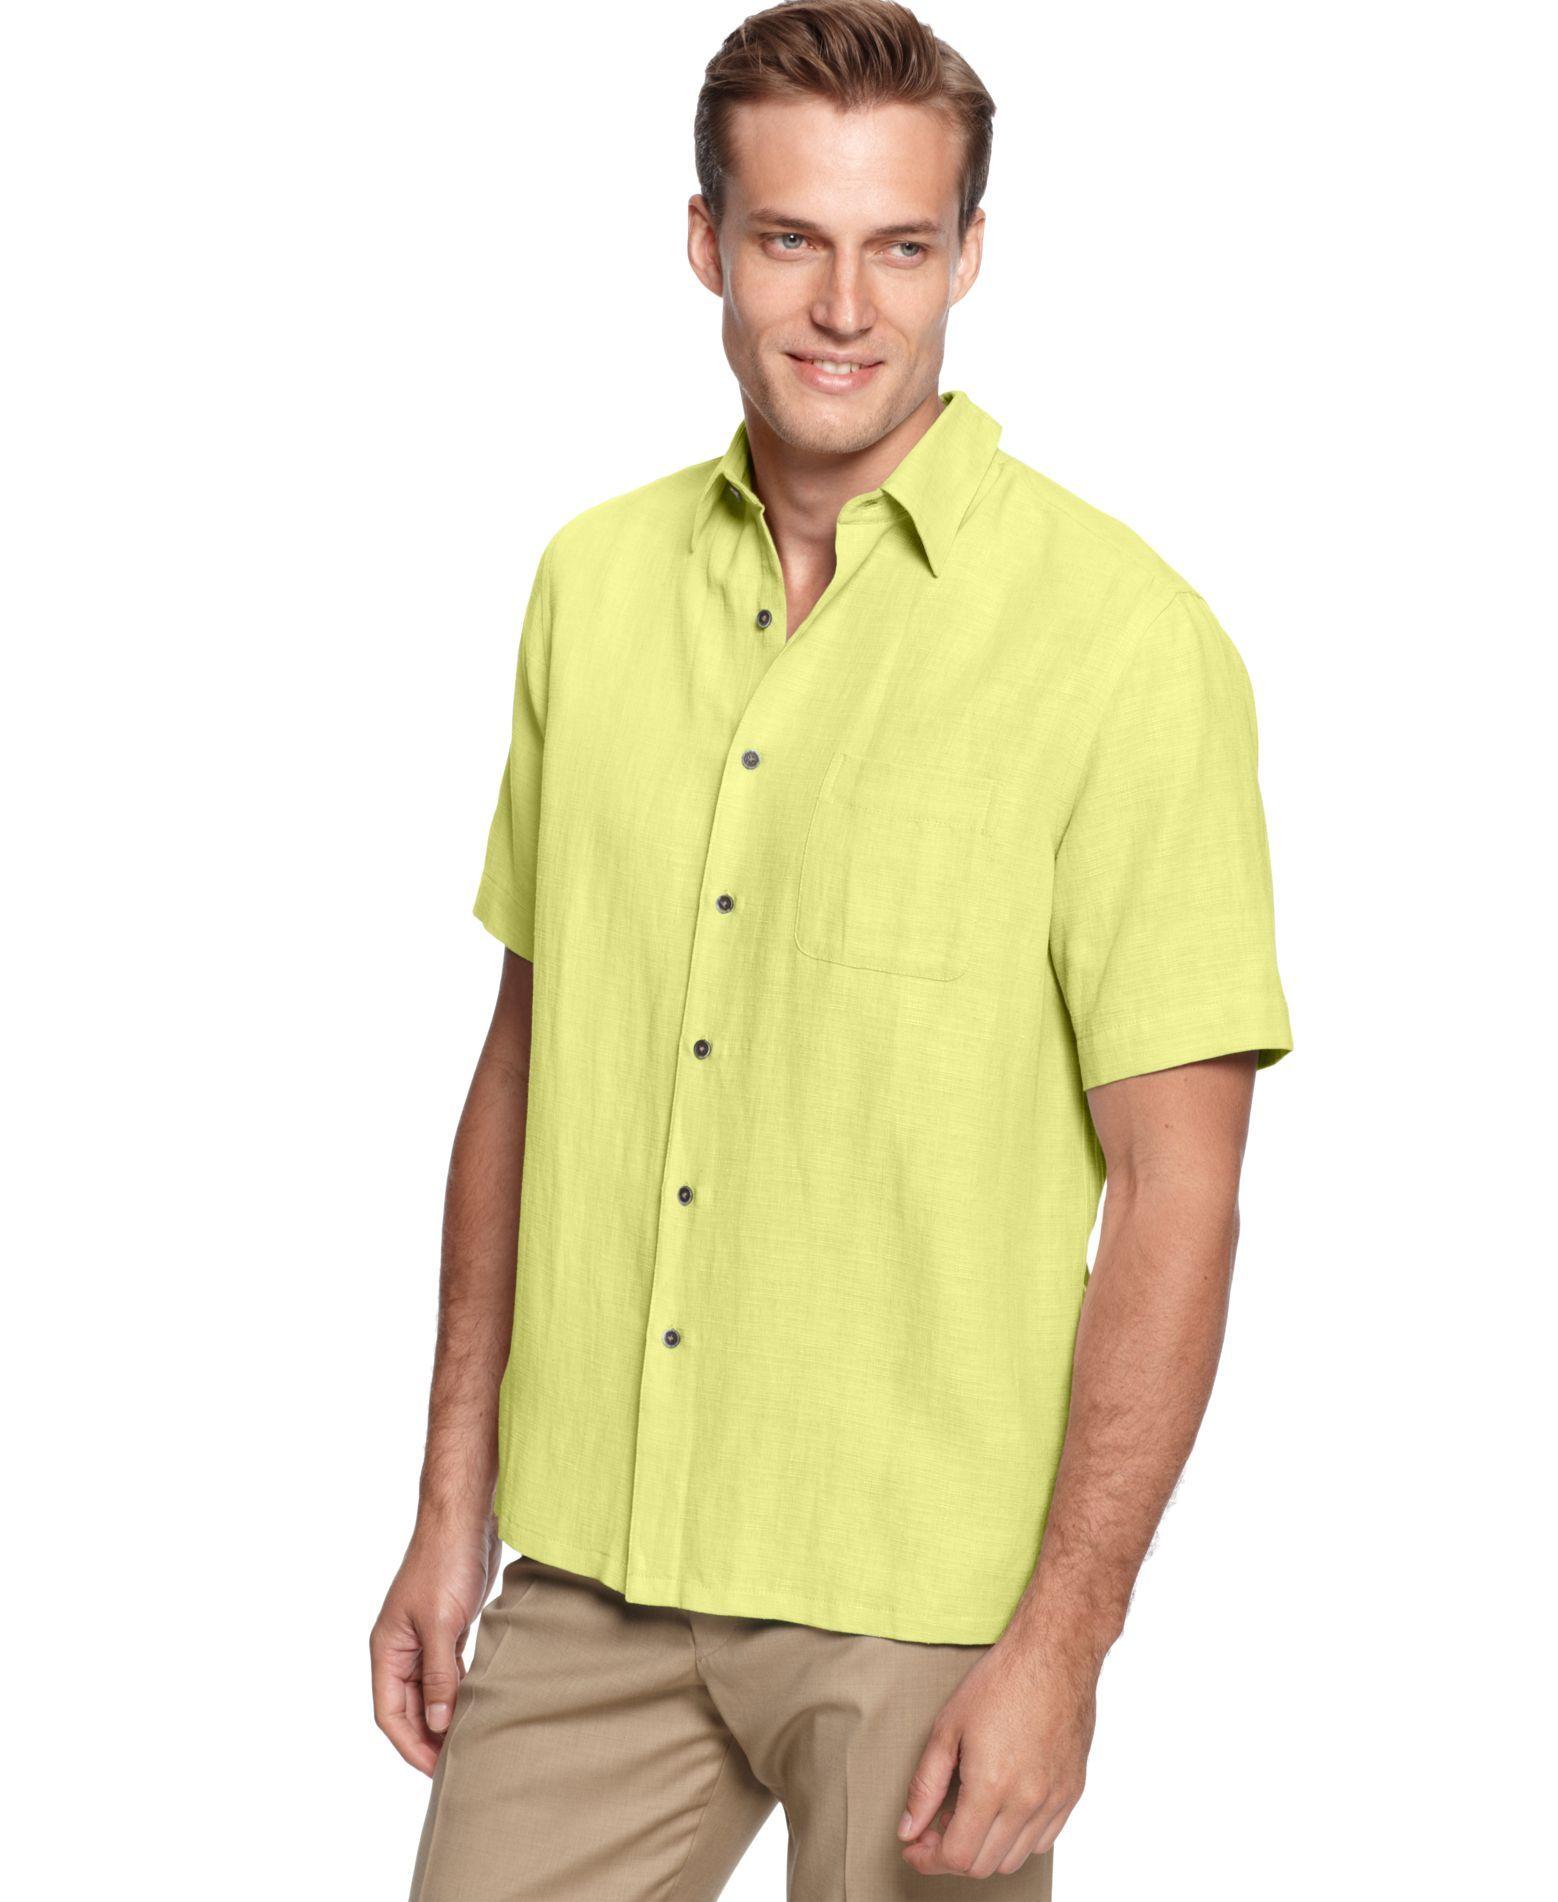 Tasso Elba Island Big and Tall Silk-Blend Crosshatch Solid Shirt